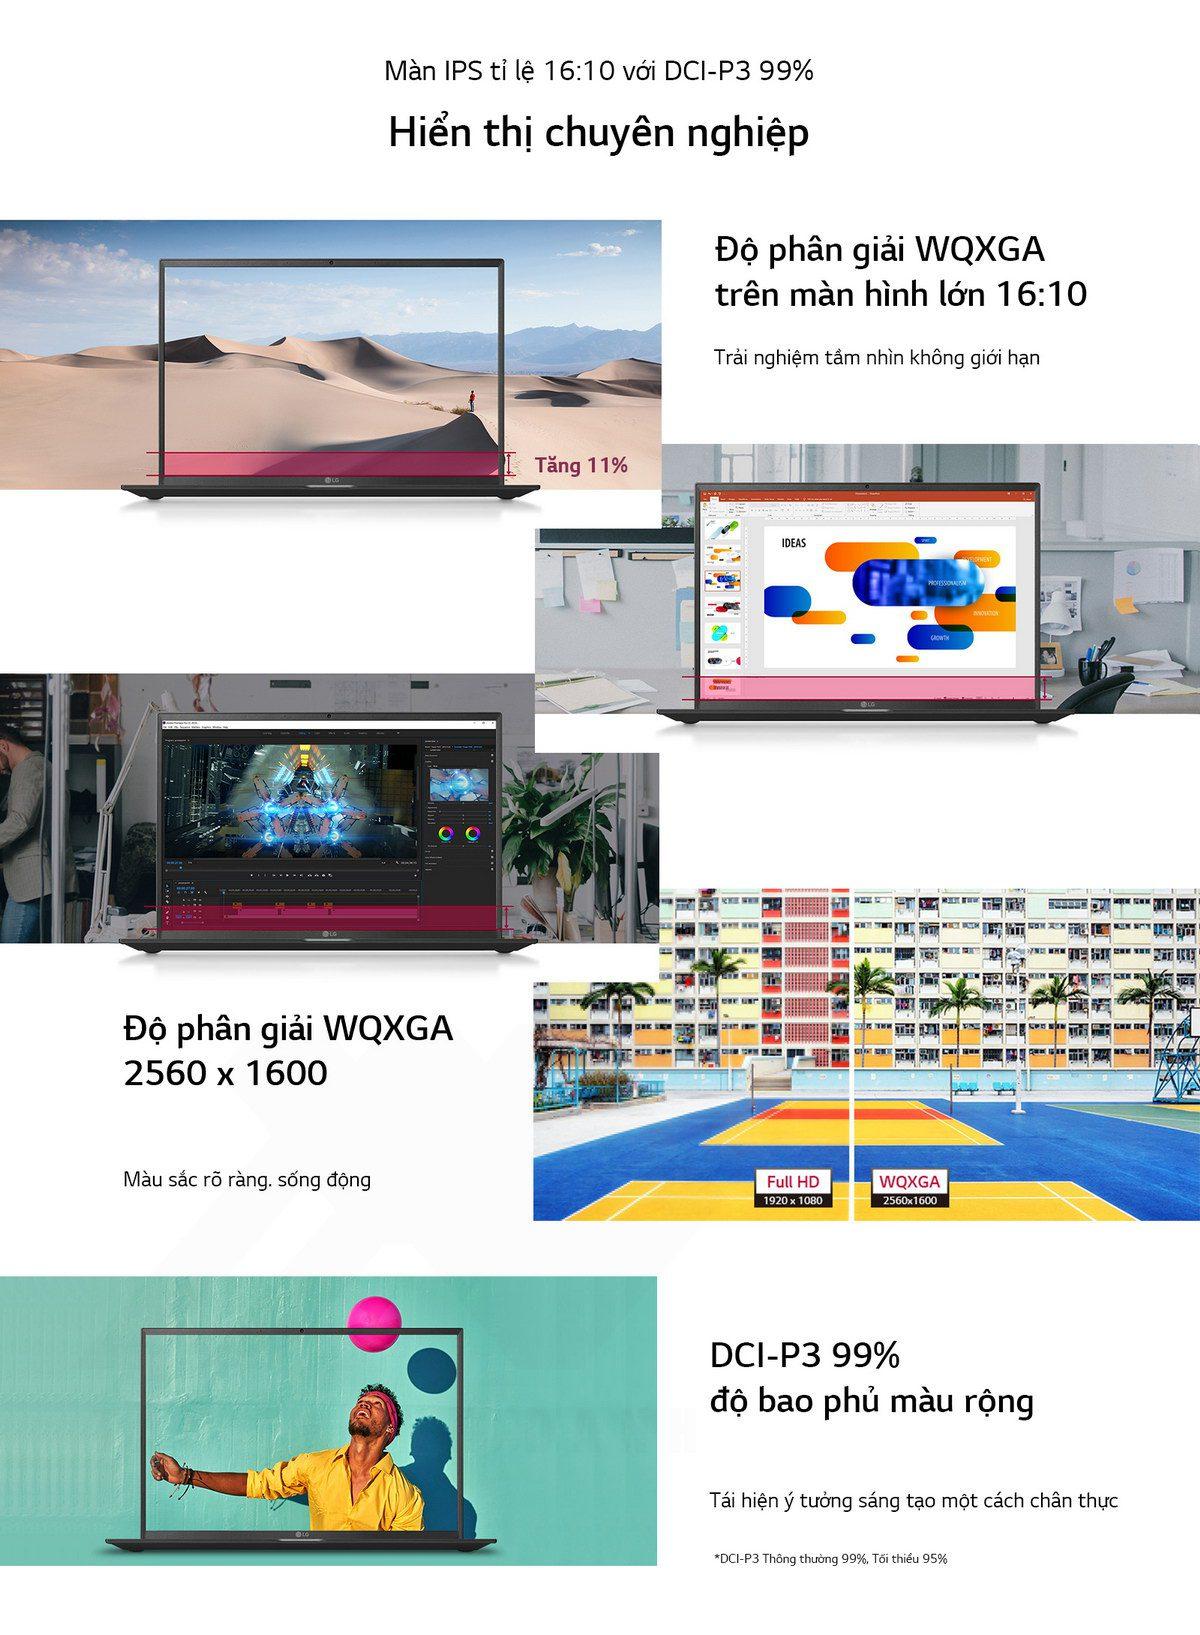 LG gram 2021 16Z90P G.AH75A5 Laptop 3 1